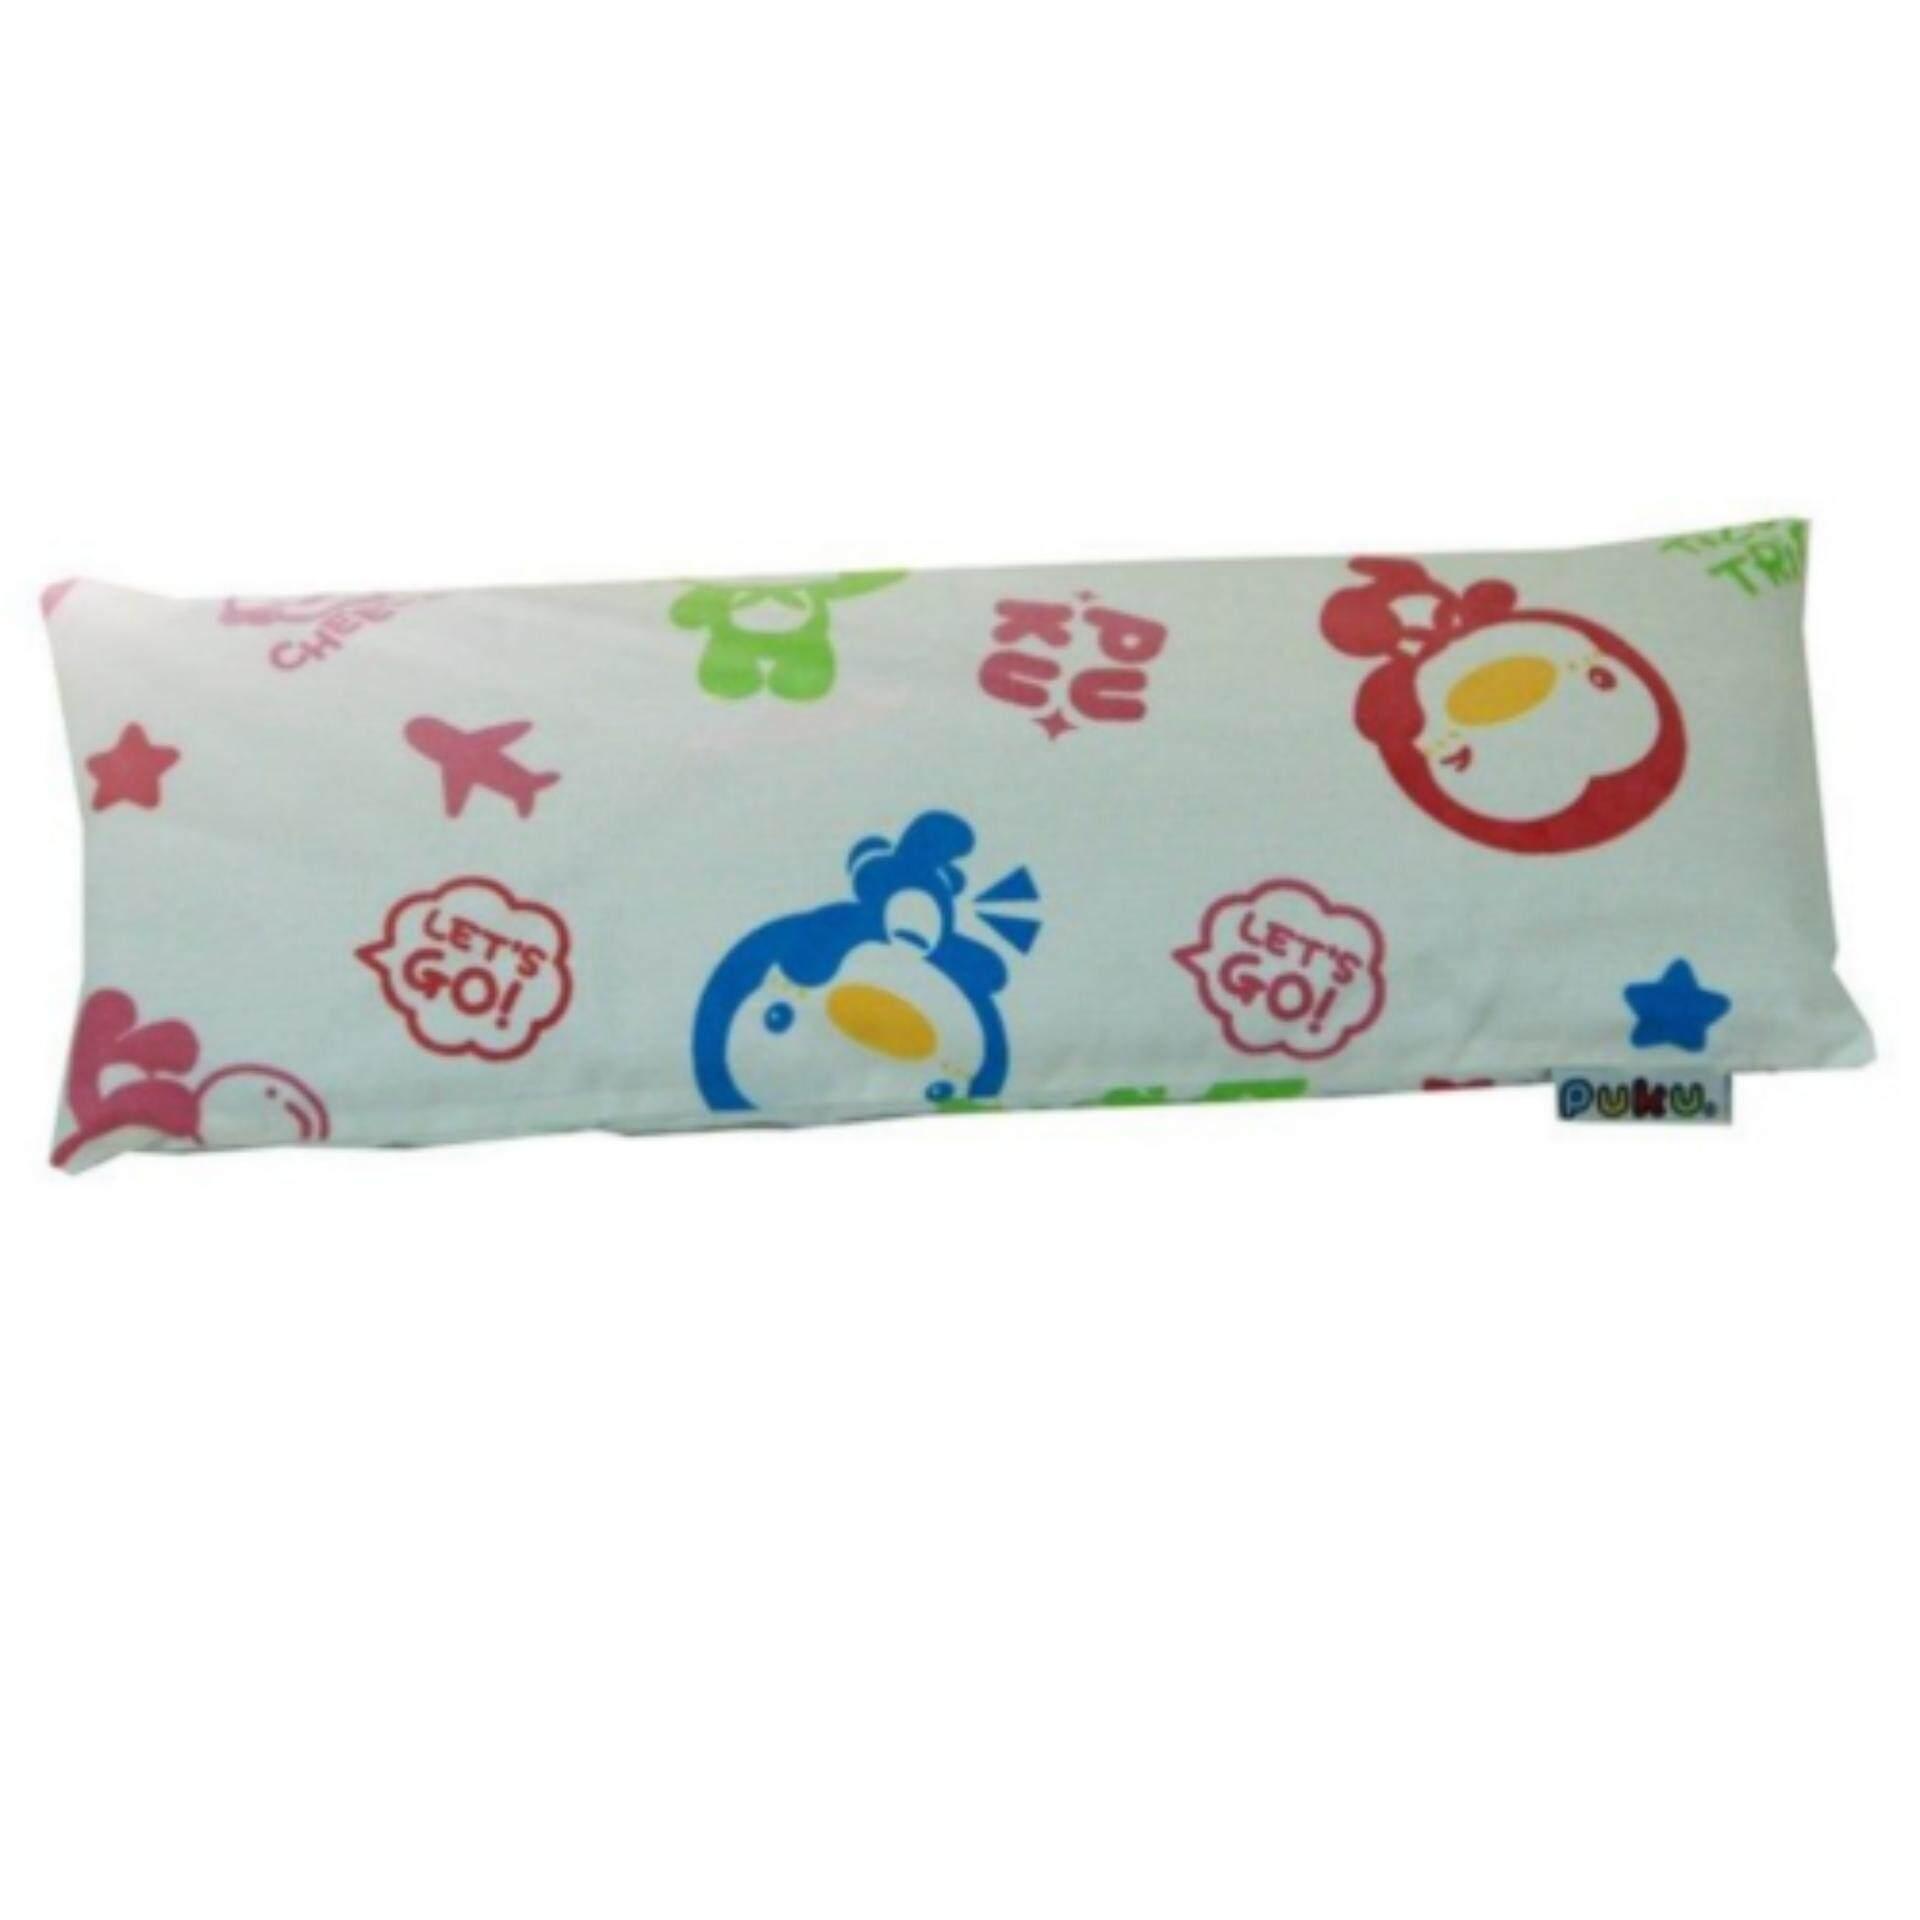 Puku Baby Organic Bean Sprout Pillow 100% Cotton Pillow Girl Varies Designs